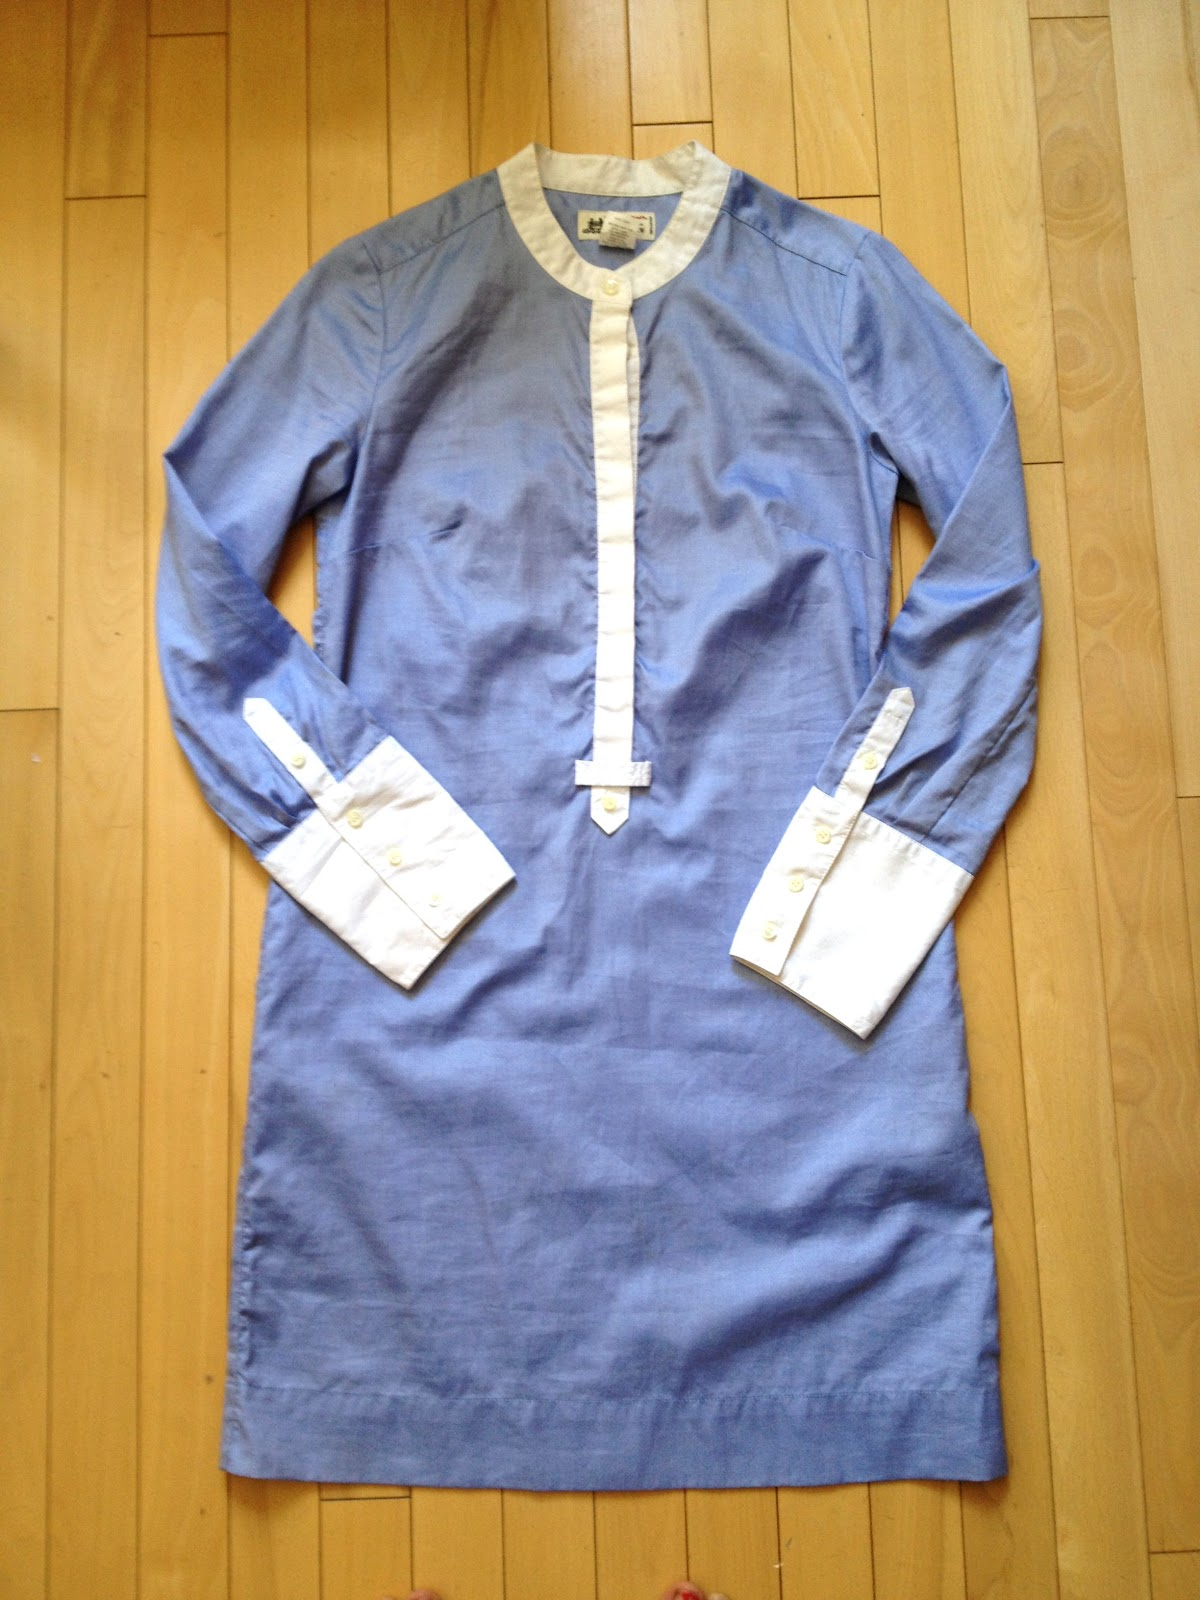 Laws Of General Economy J Crew Shirtdress In Thomas Mason